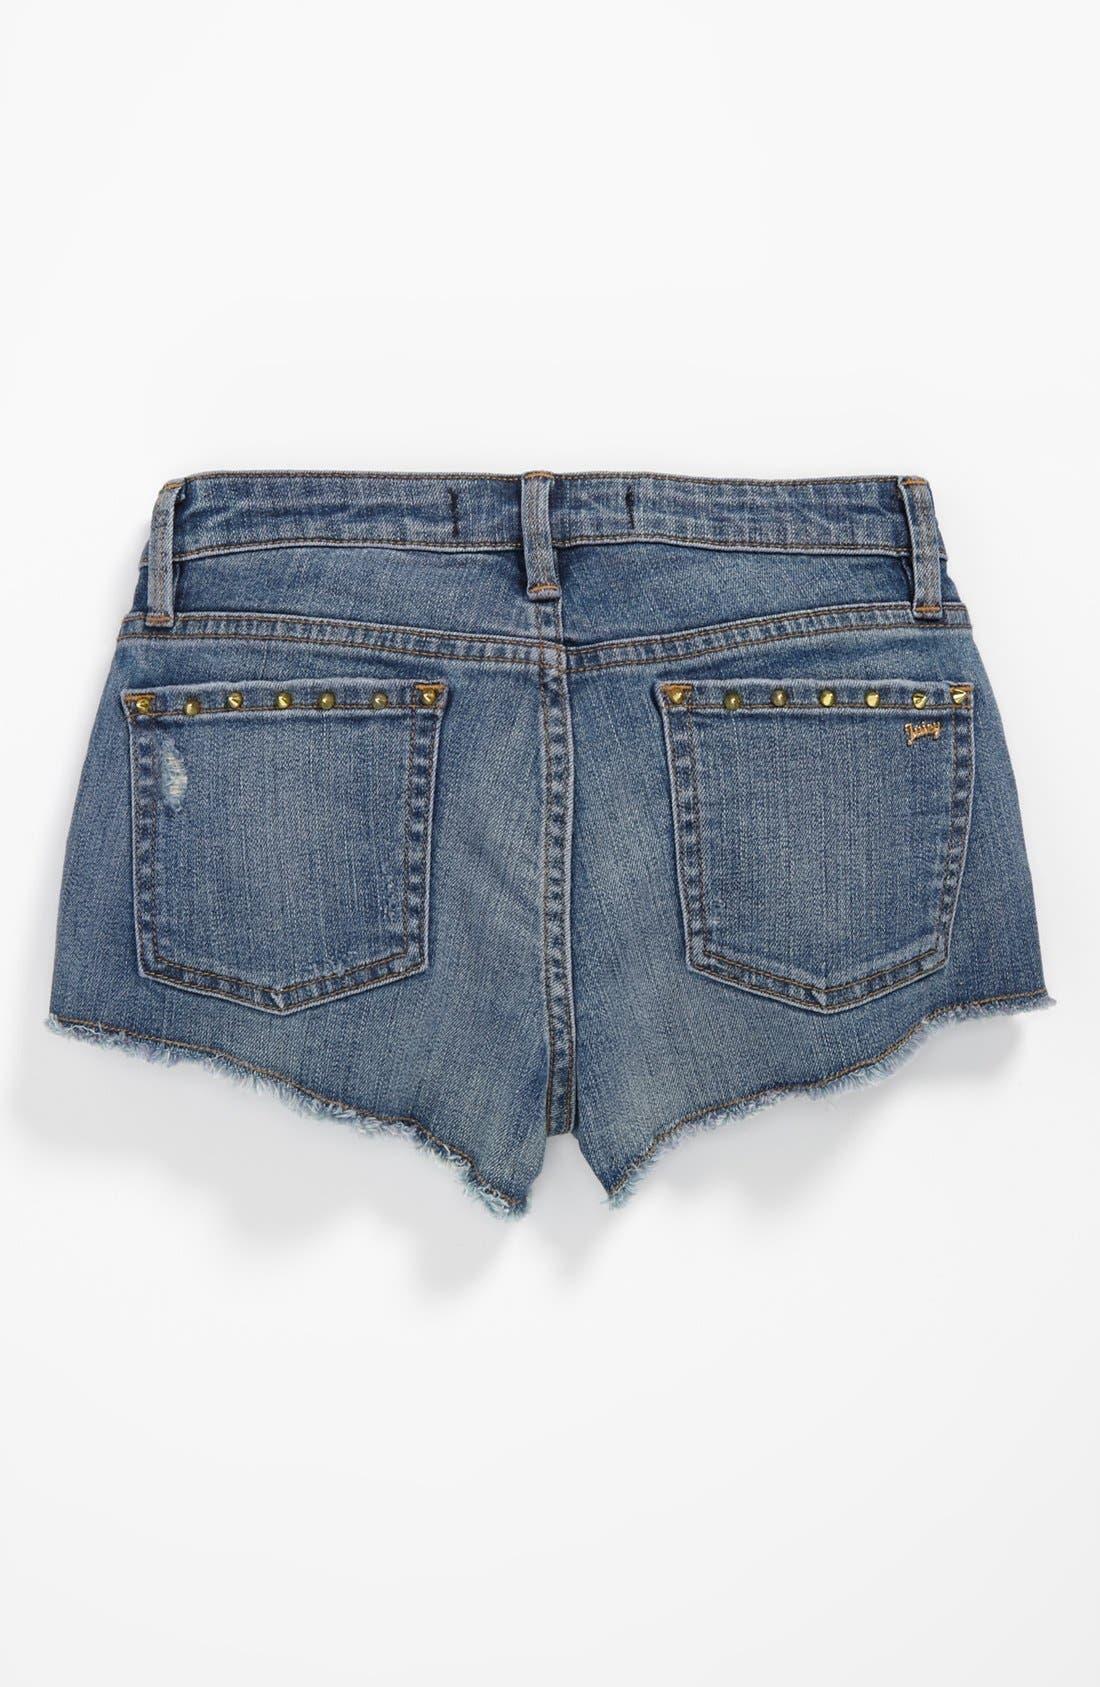 Alternate Image 1 Selected - Juicy Couture 'Core' Denim Cutoff Shorts (Big Girls)